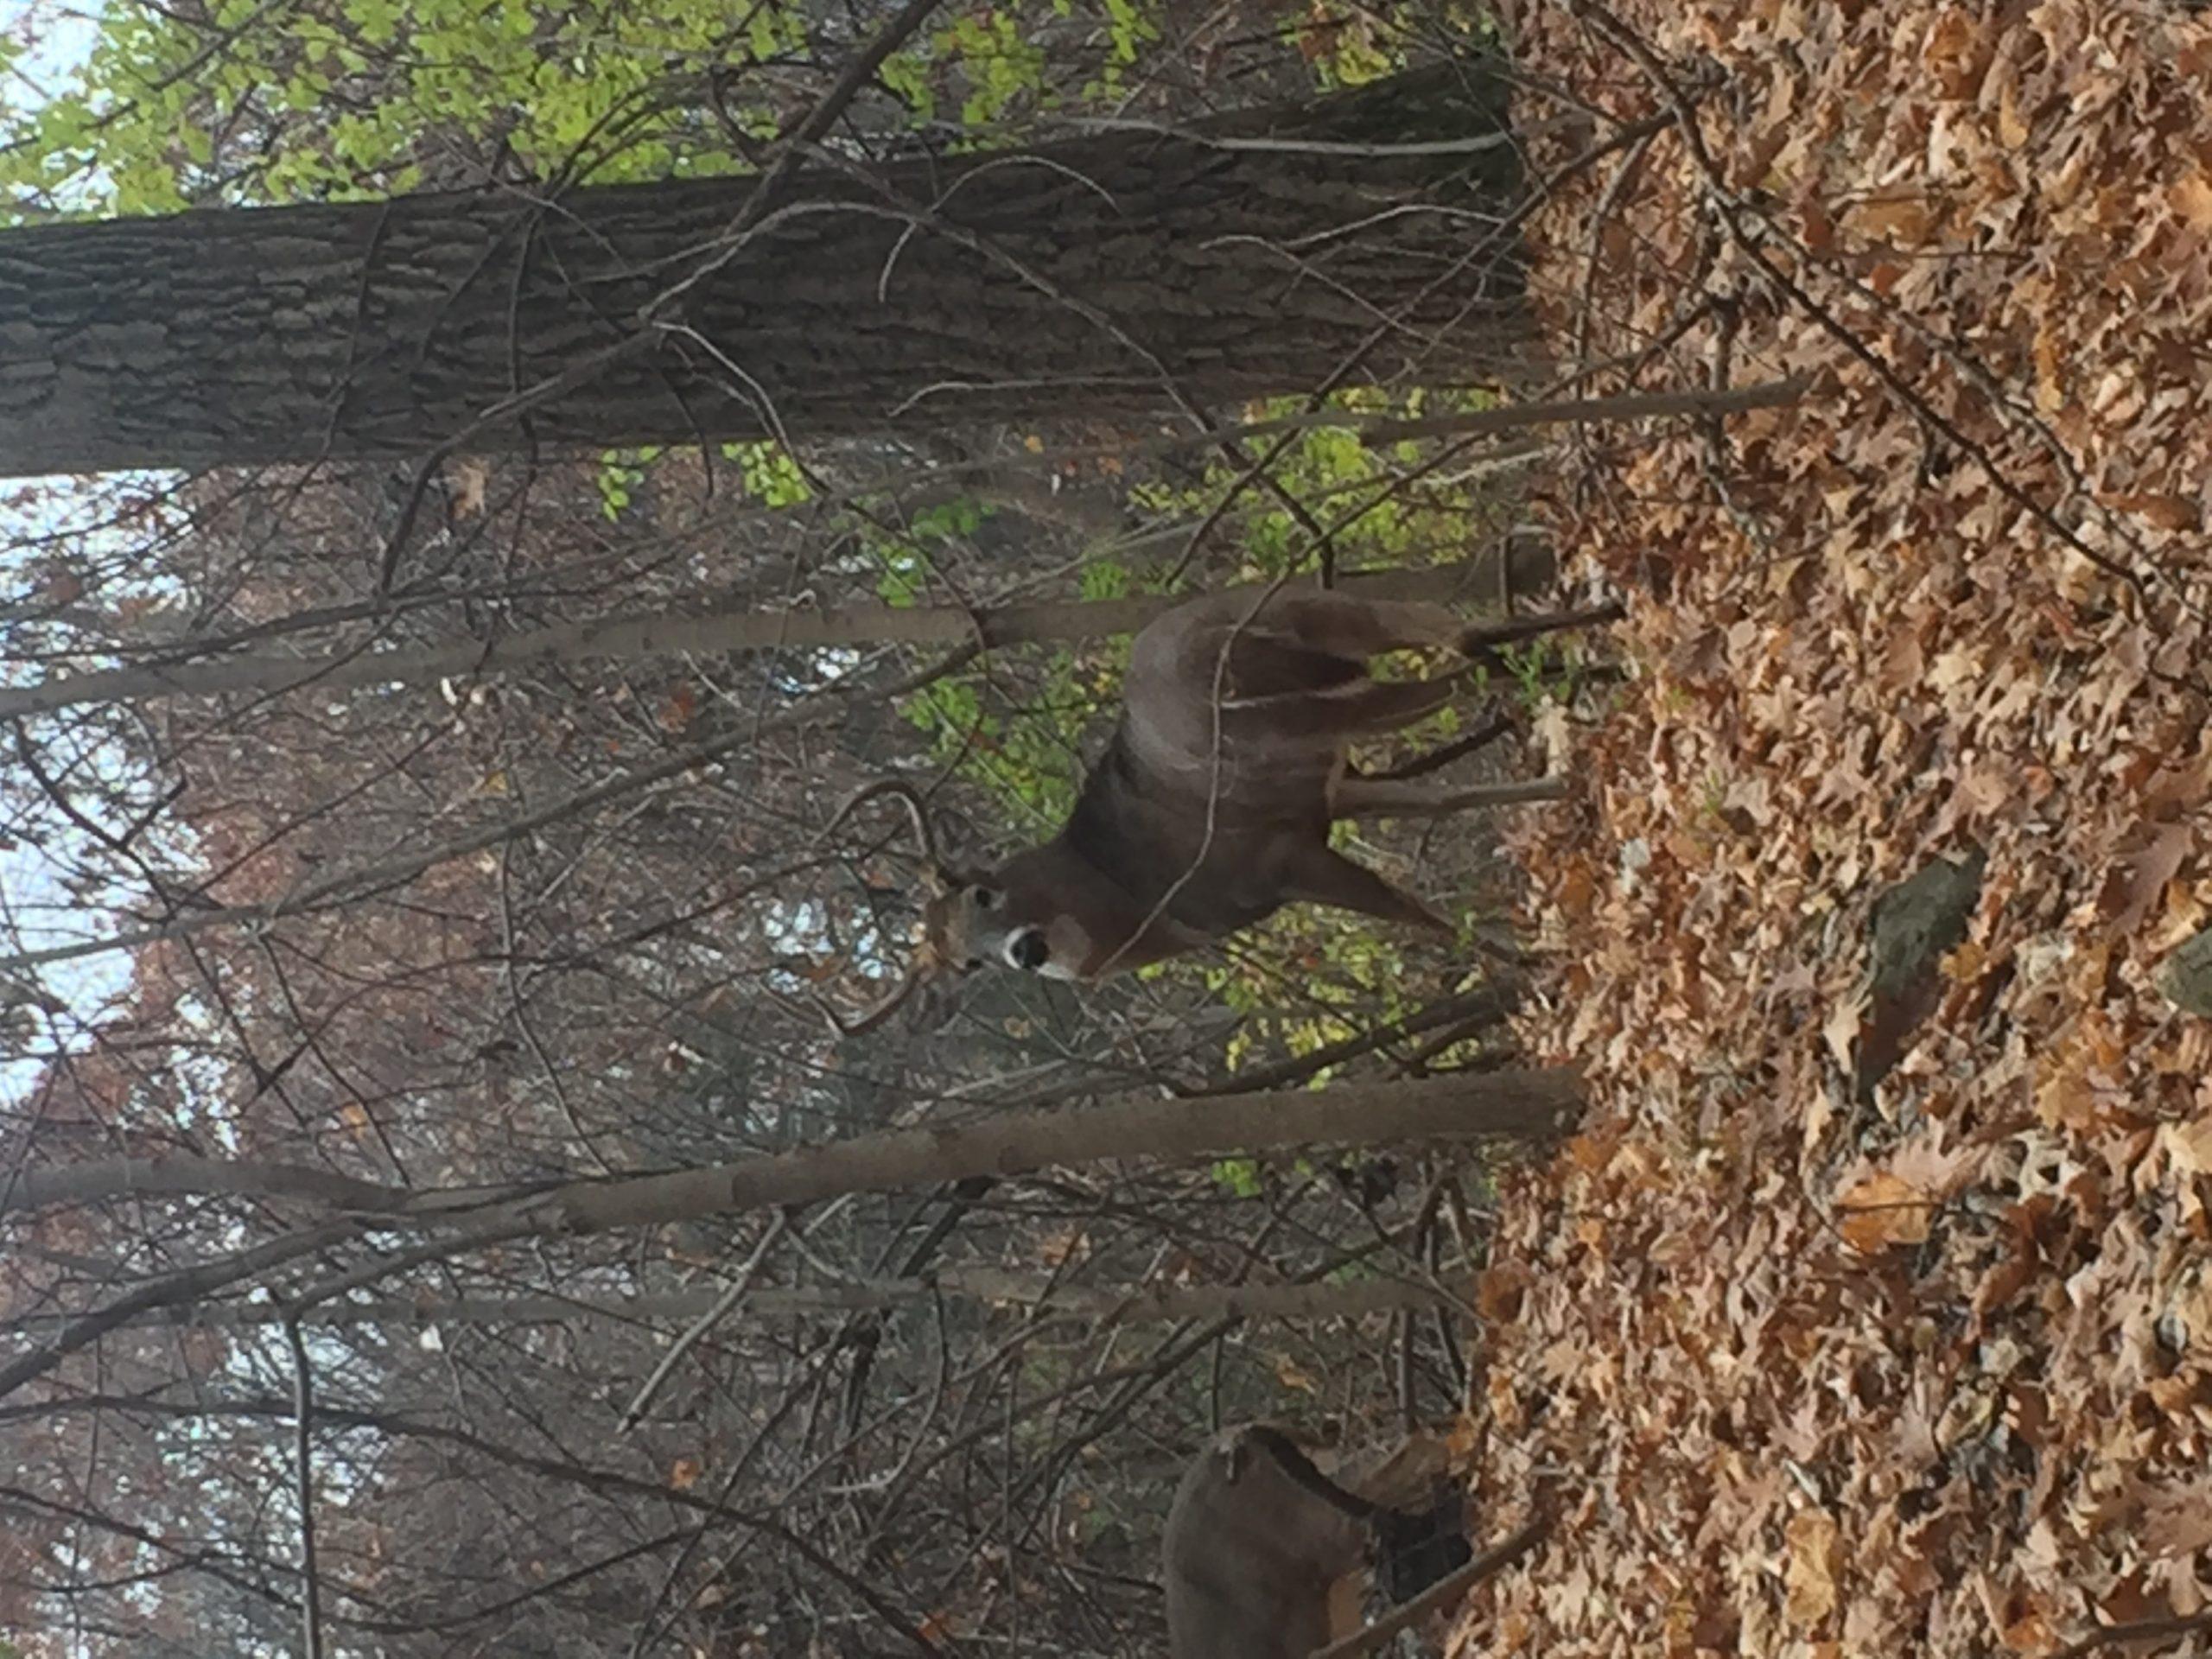 Rut Status Southern Zone - Page 4 - Deer Hunting - Hunting New York - Ny Empire State Hunting-Southern Maryland Whitetail Deer Rut